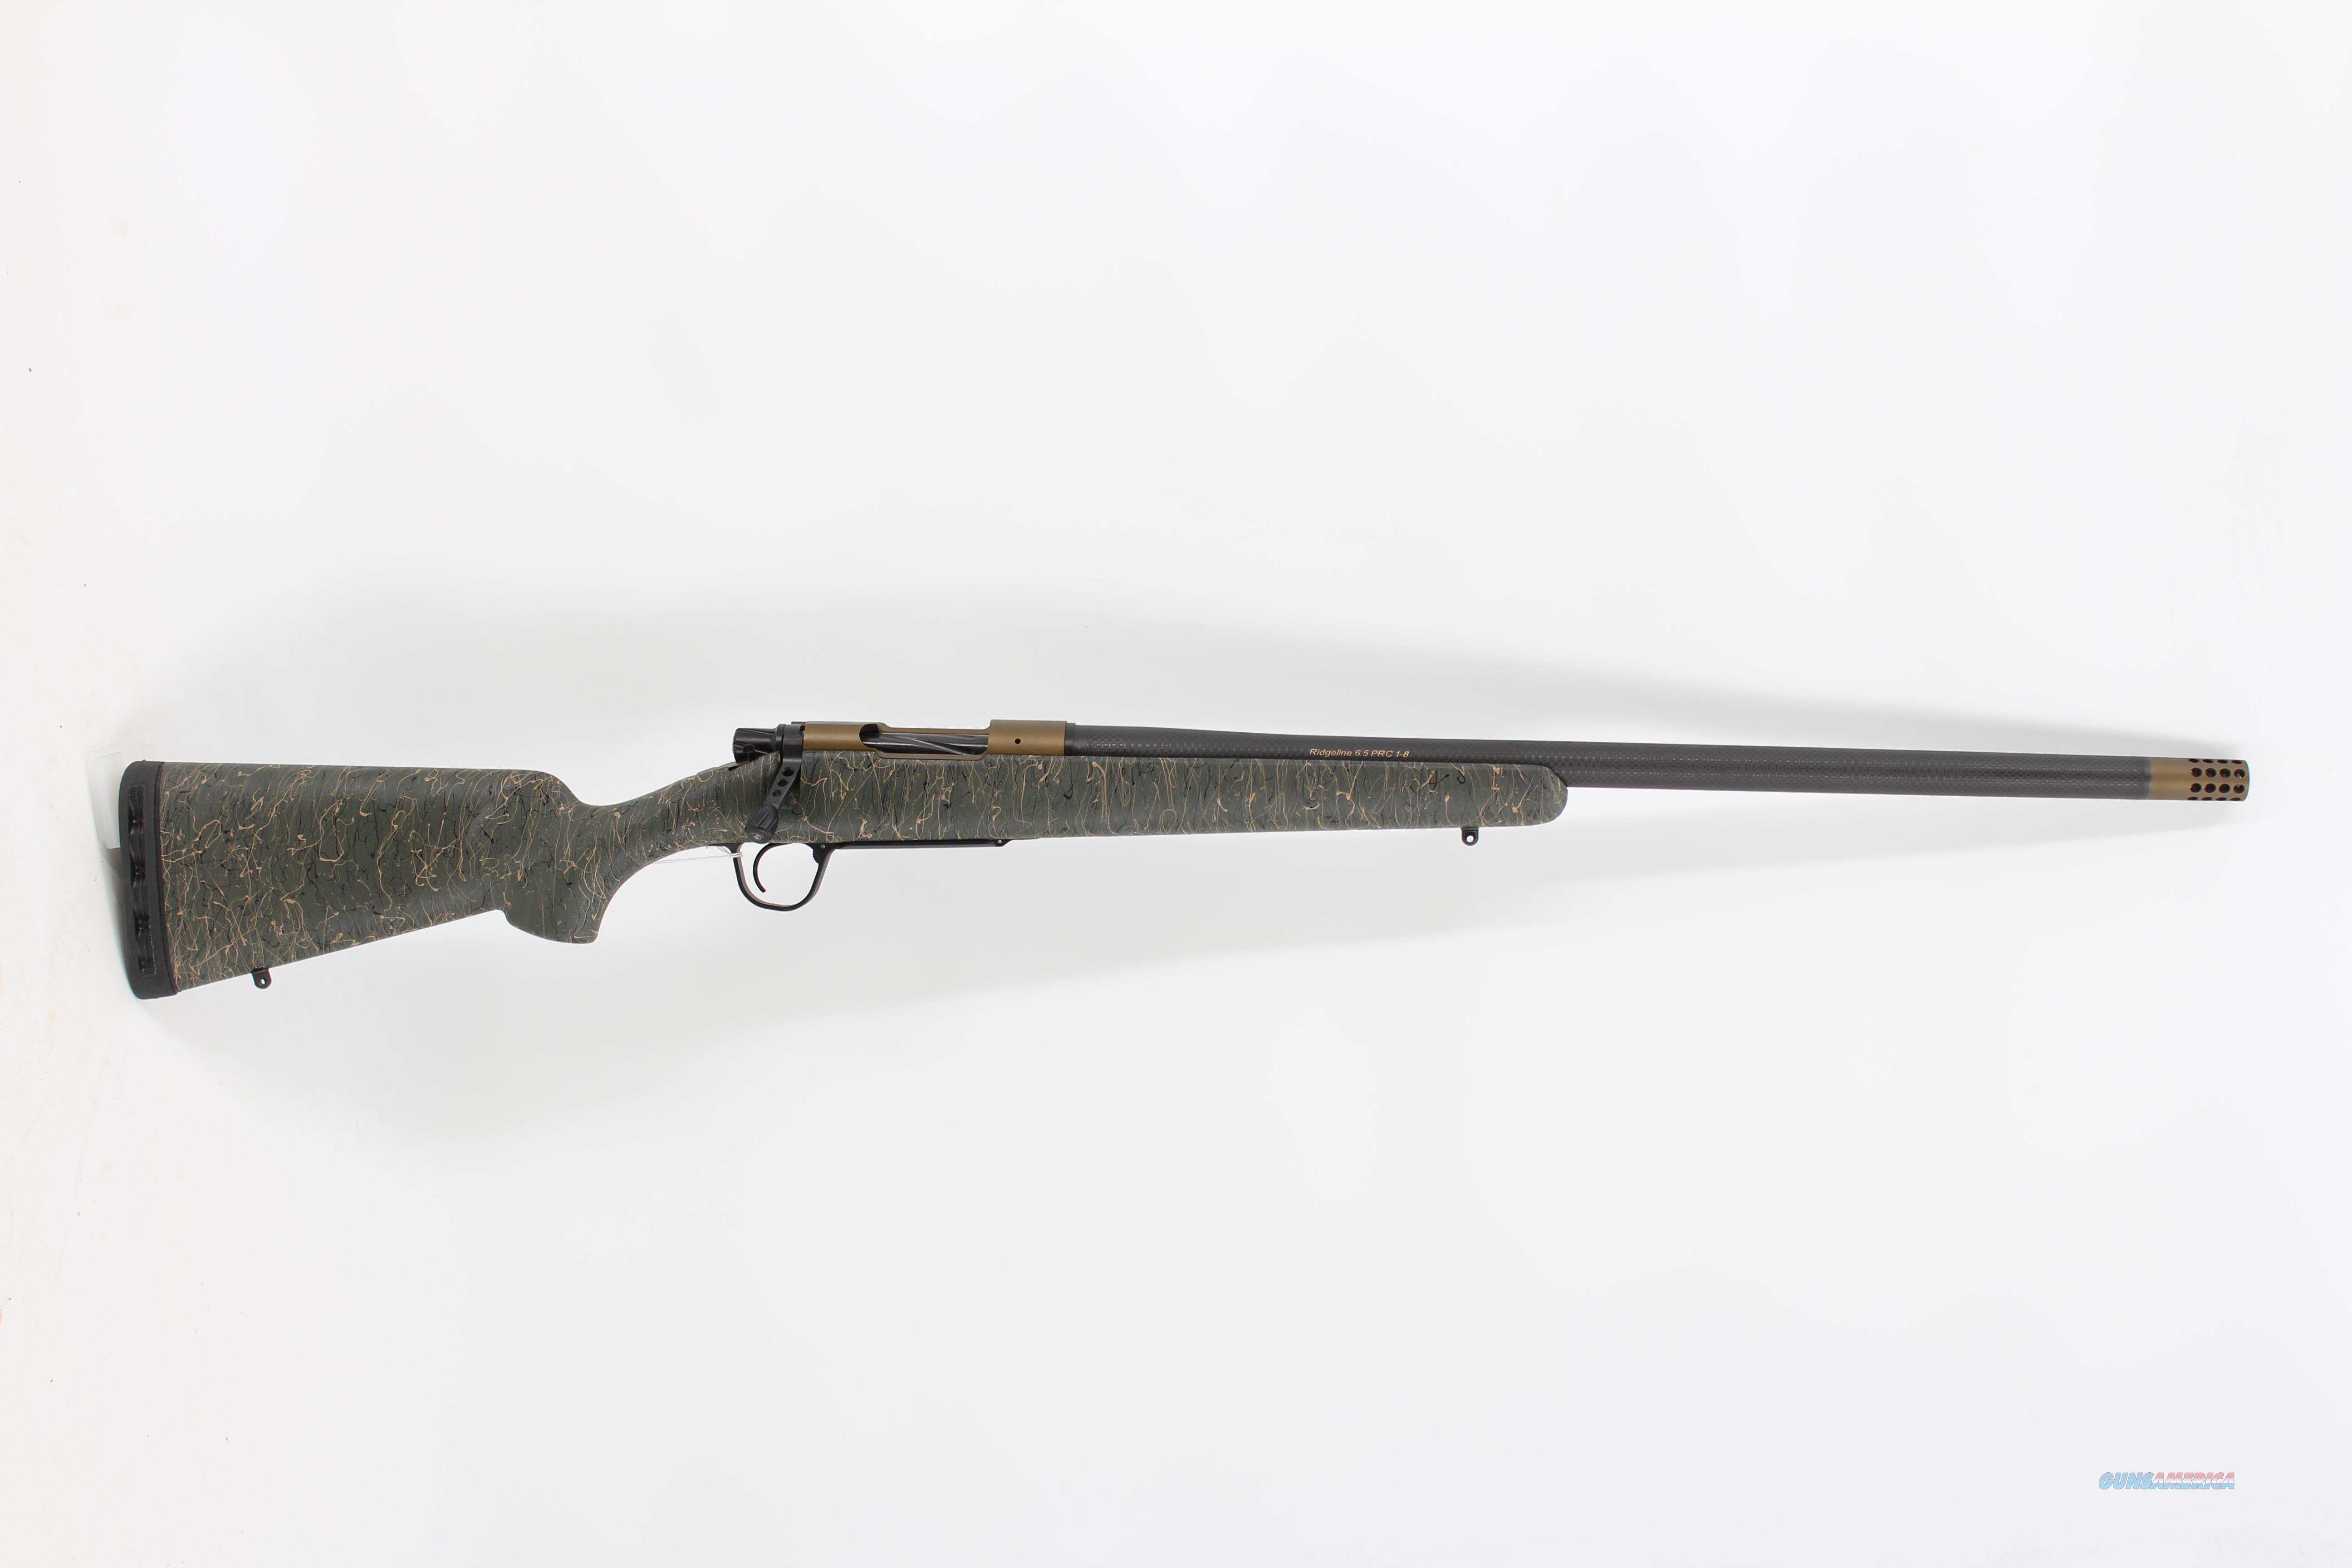 Christensen Arms Ridgeline Carbon 6.5PRC Grn/Tan/Blk  Guns > Rifles > C Misc Rifles